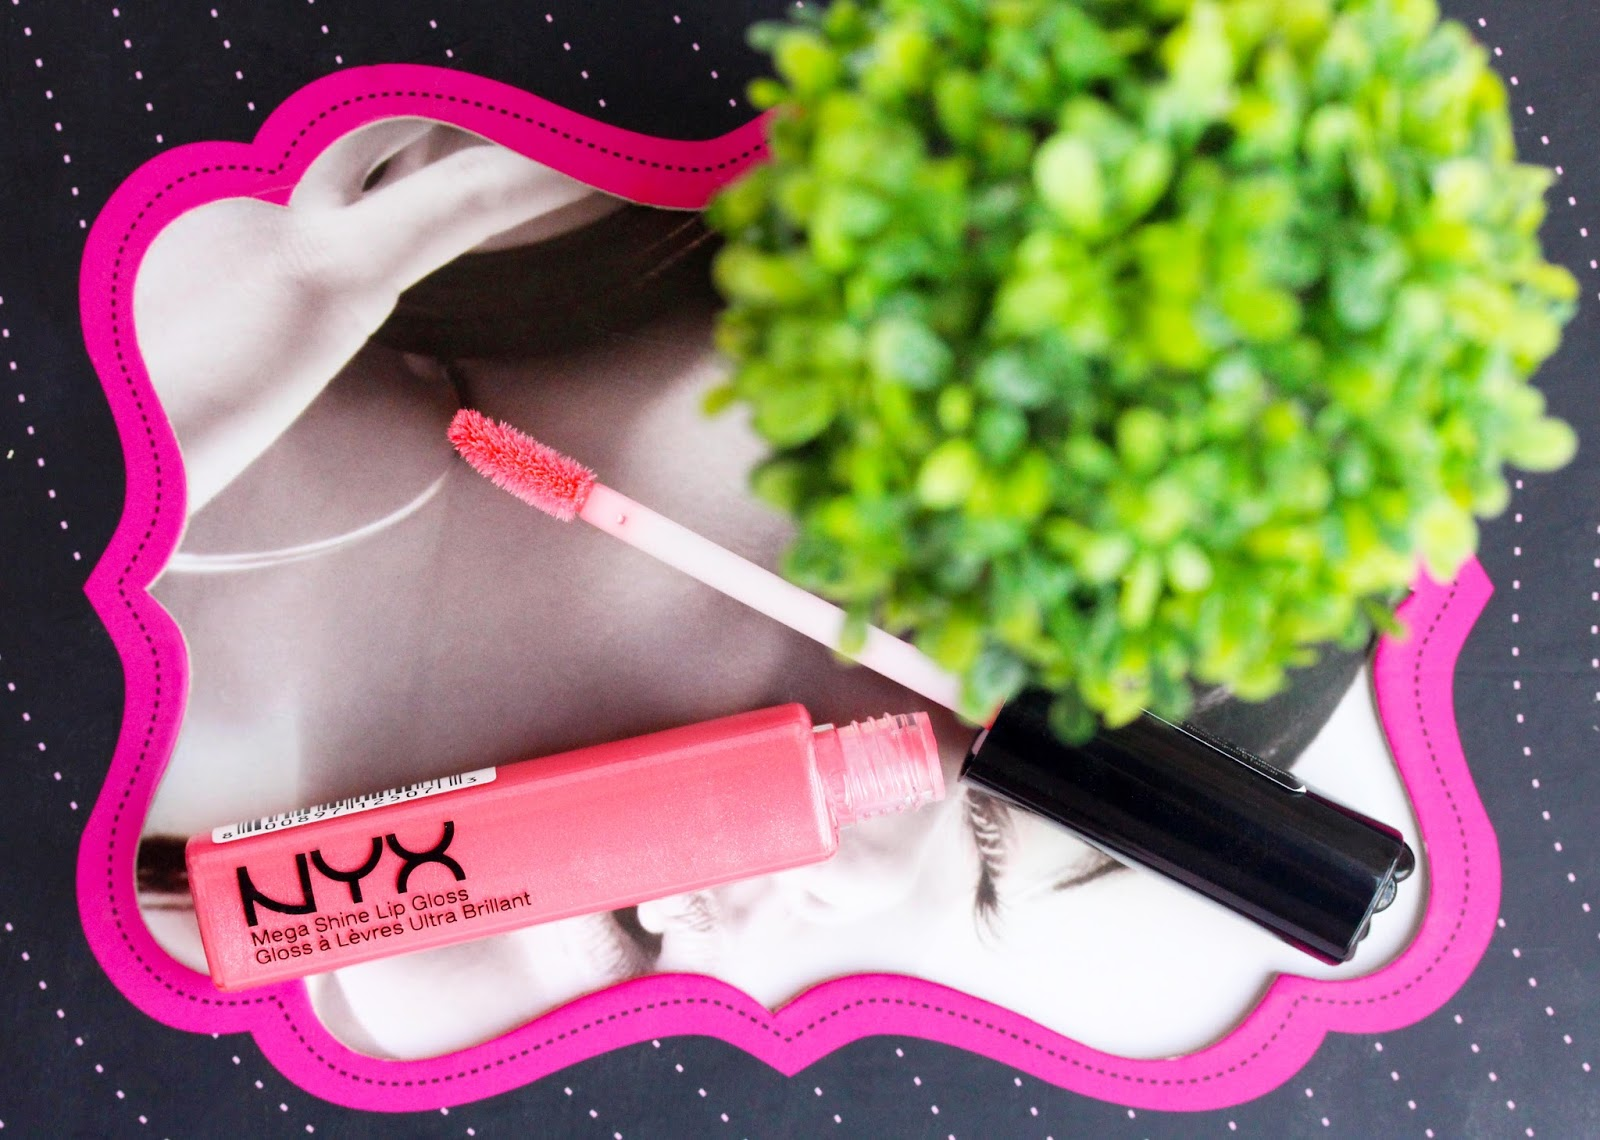 NYX Mega Shine Lip Gloss in La La